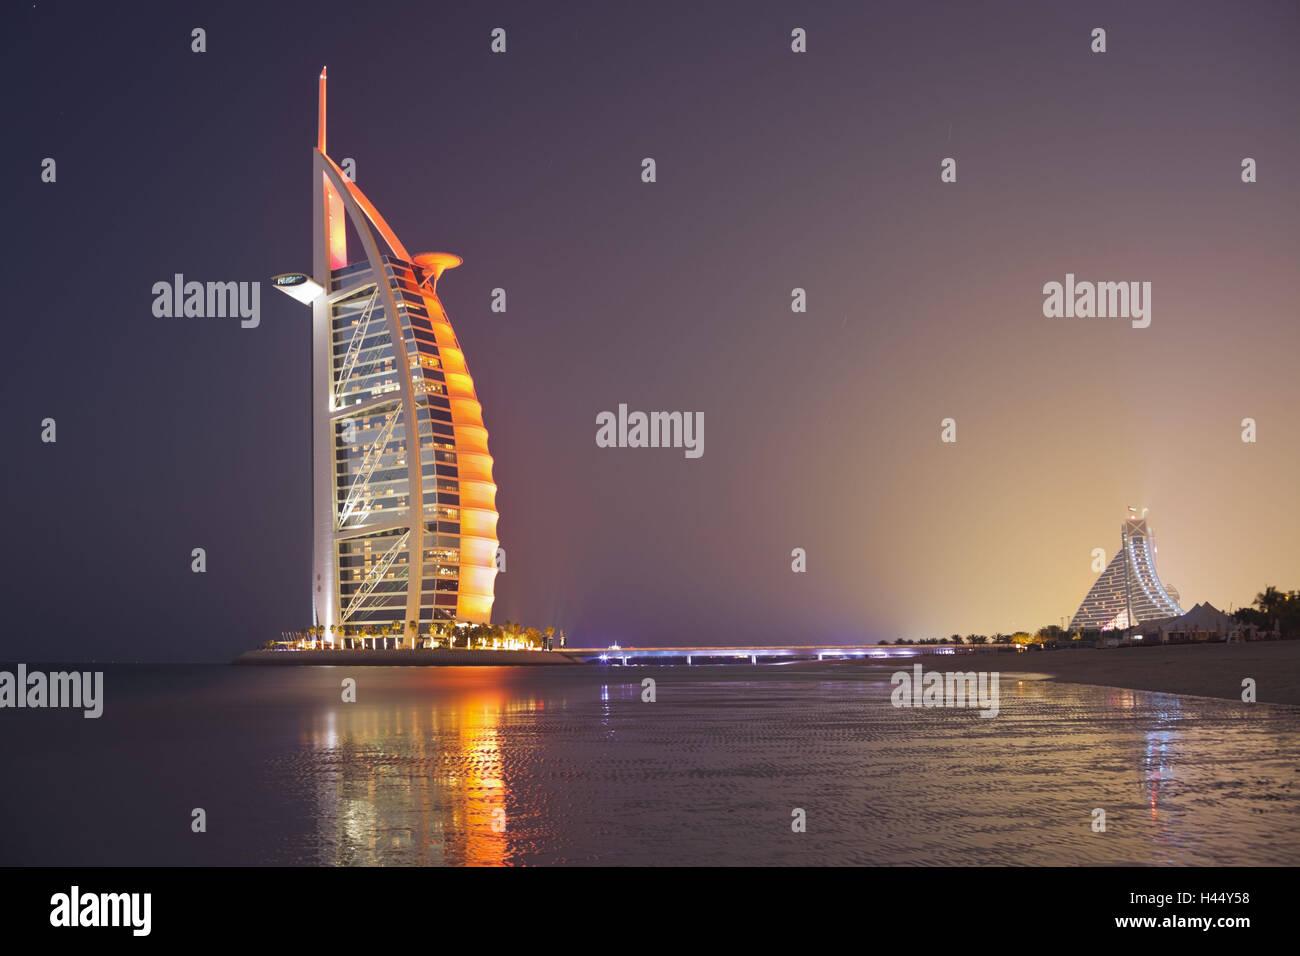 Emirats Arabes Unis, Dubaï, Burj Al Arab, l'humeur du soir, Photo Stock